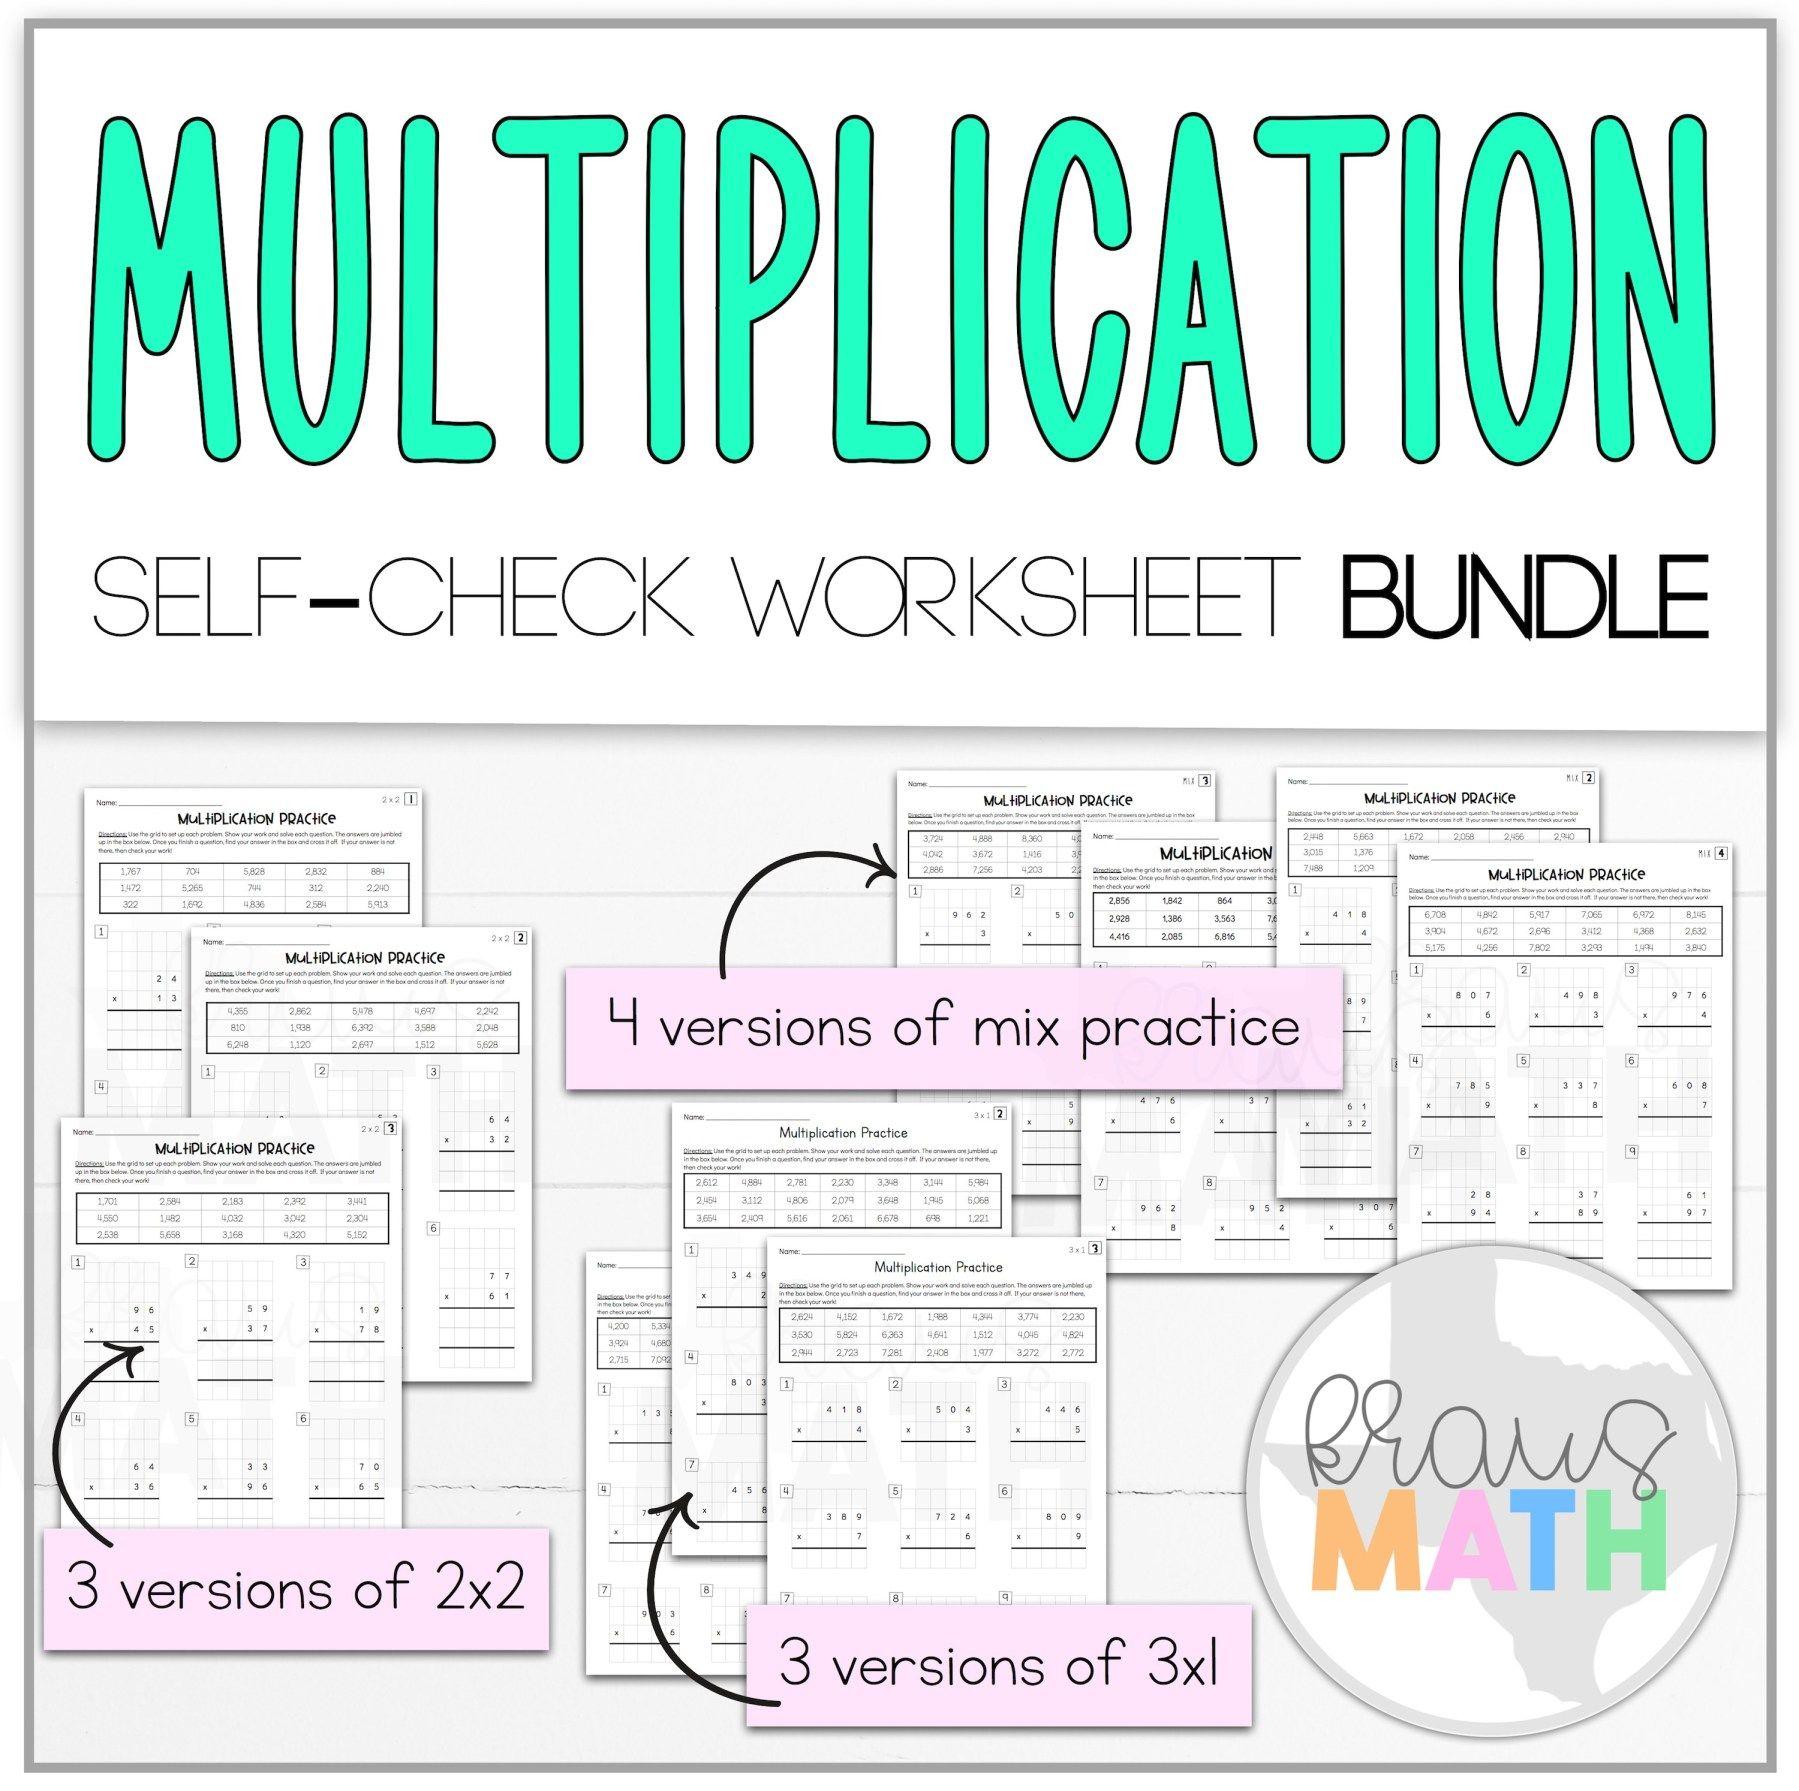 Multiplication 2x2 3x1 Self Check Worksheet Bundle Teks 4 4d Kraus Math Math Teks Teaching Multiplication Math Worksheets [ 1791 x 1799 Pixel ]